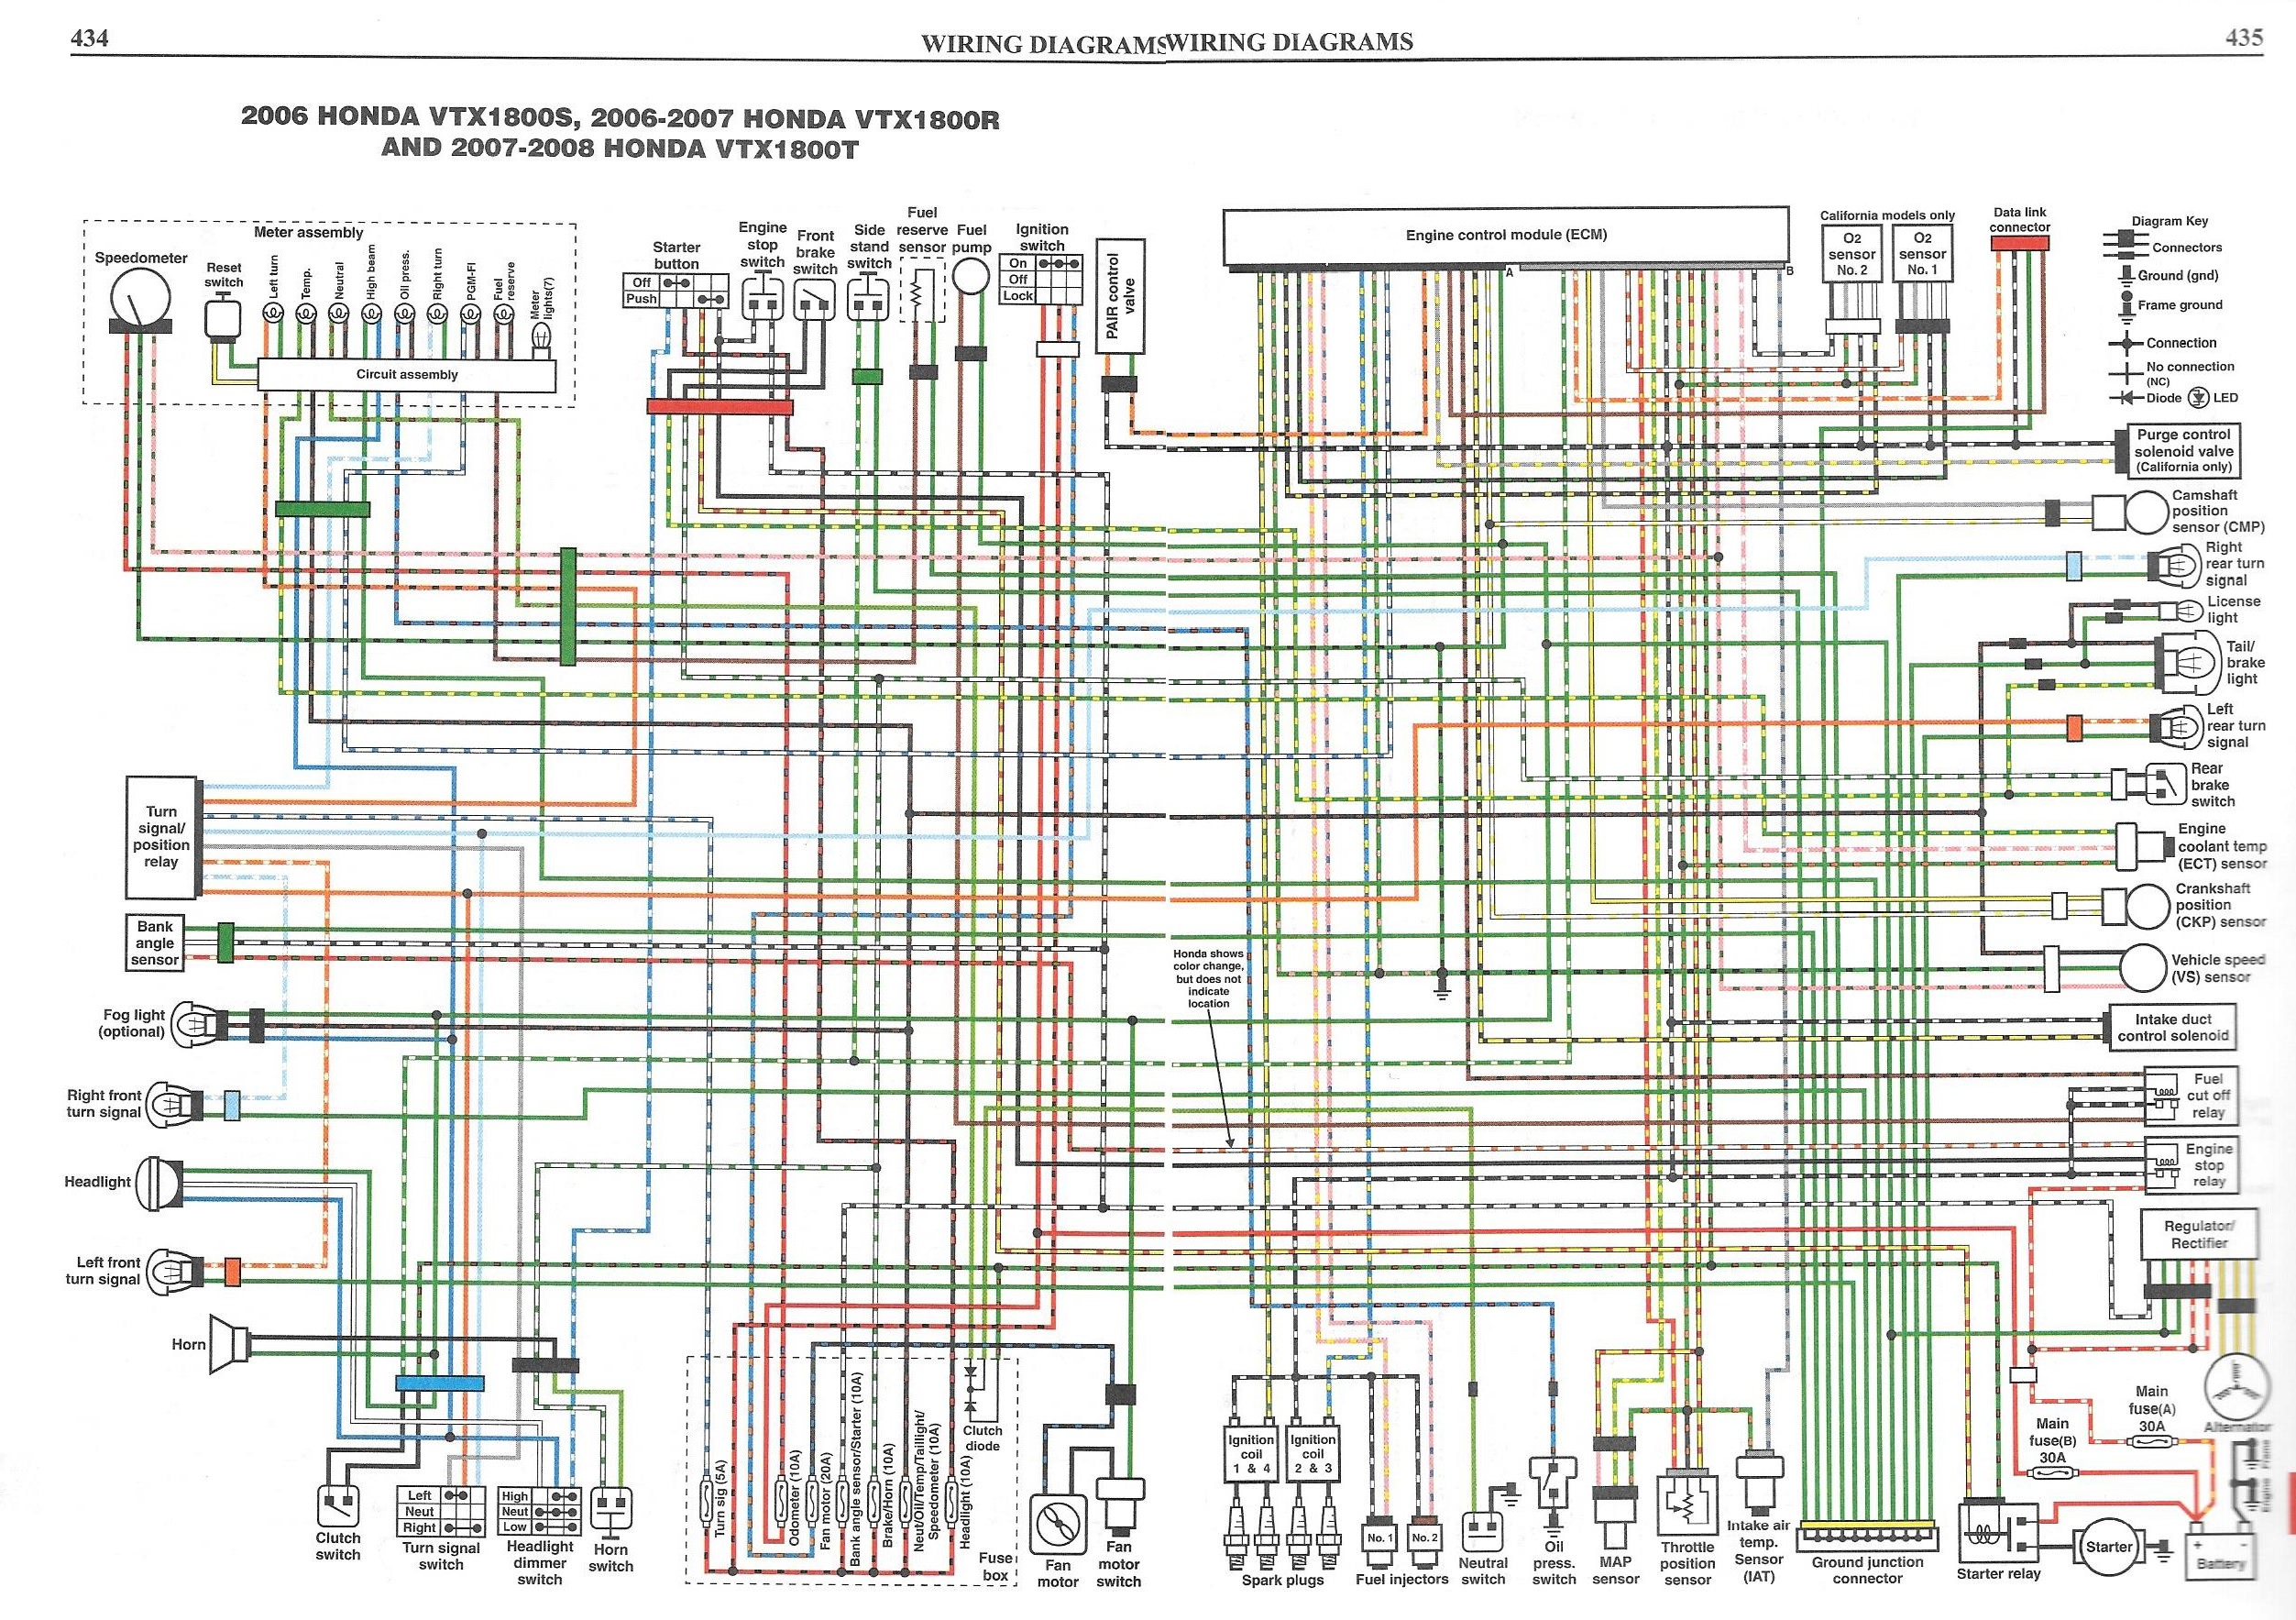 [SCHEMATICS_48DE]  Remote display LED indications (Turn, F1, Fuel ect…) | Honda VTX 1300 / VTX  1800 Motorcycles Forum | Vtx 1800c Wiring Diagram |  | VTX Cafe